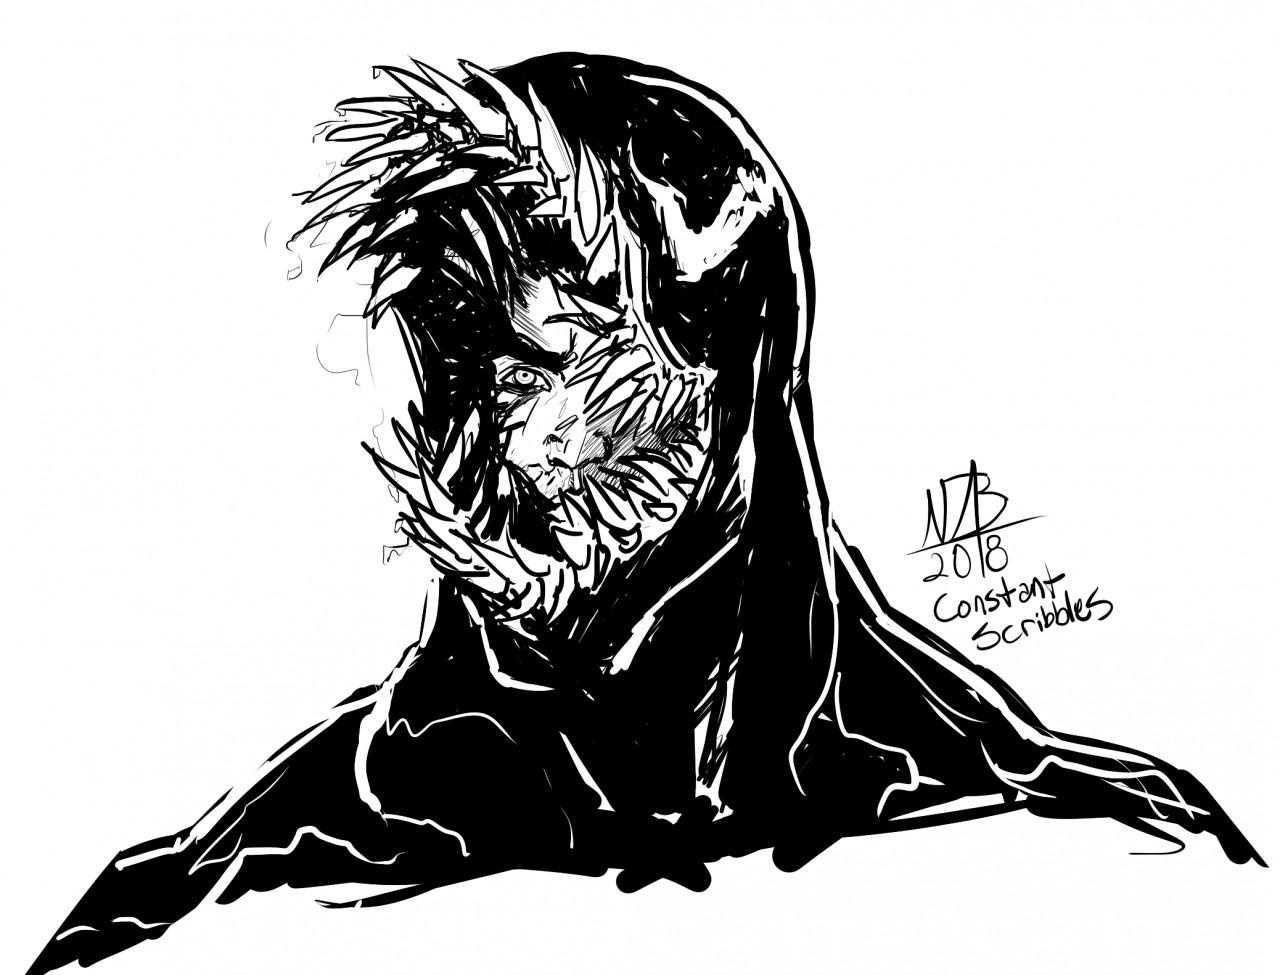 1280x975 Venom Forming Sketch